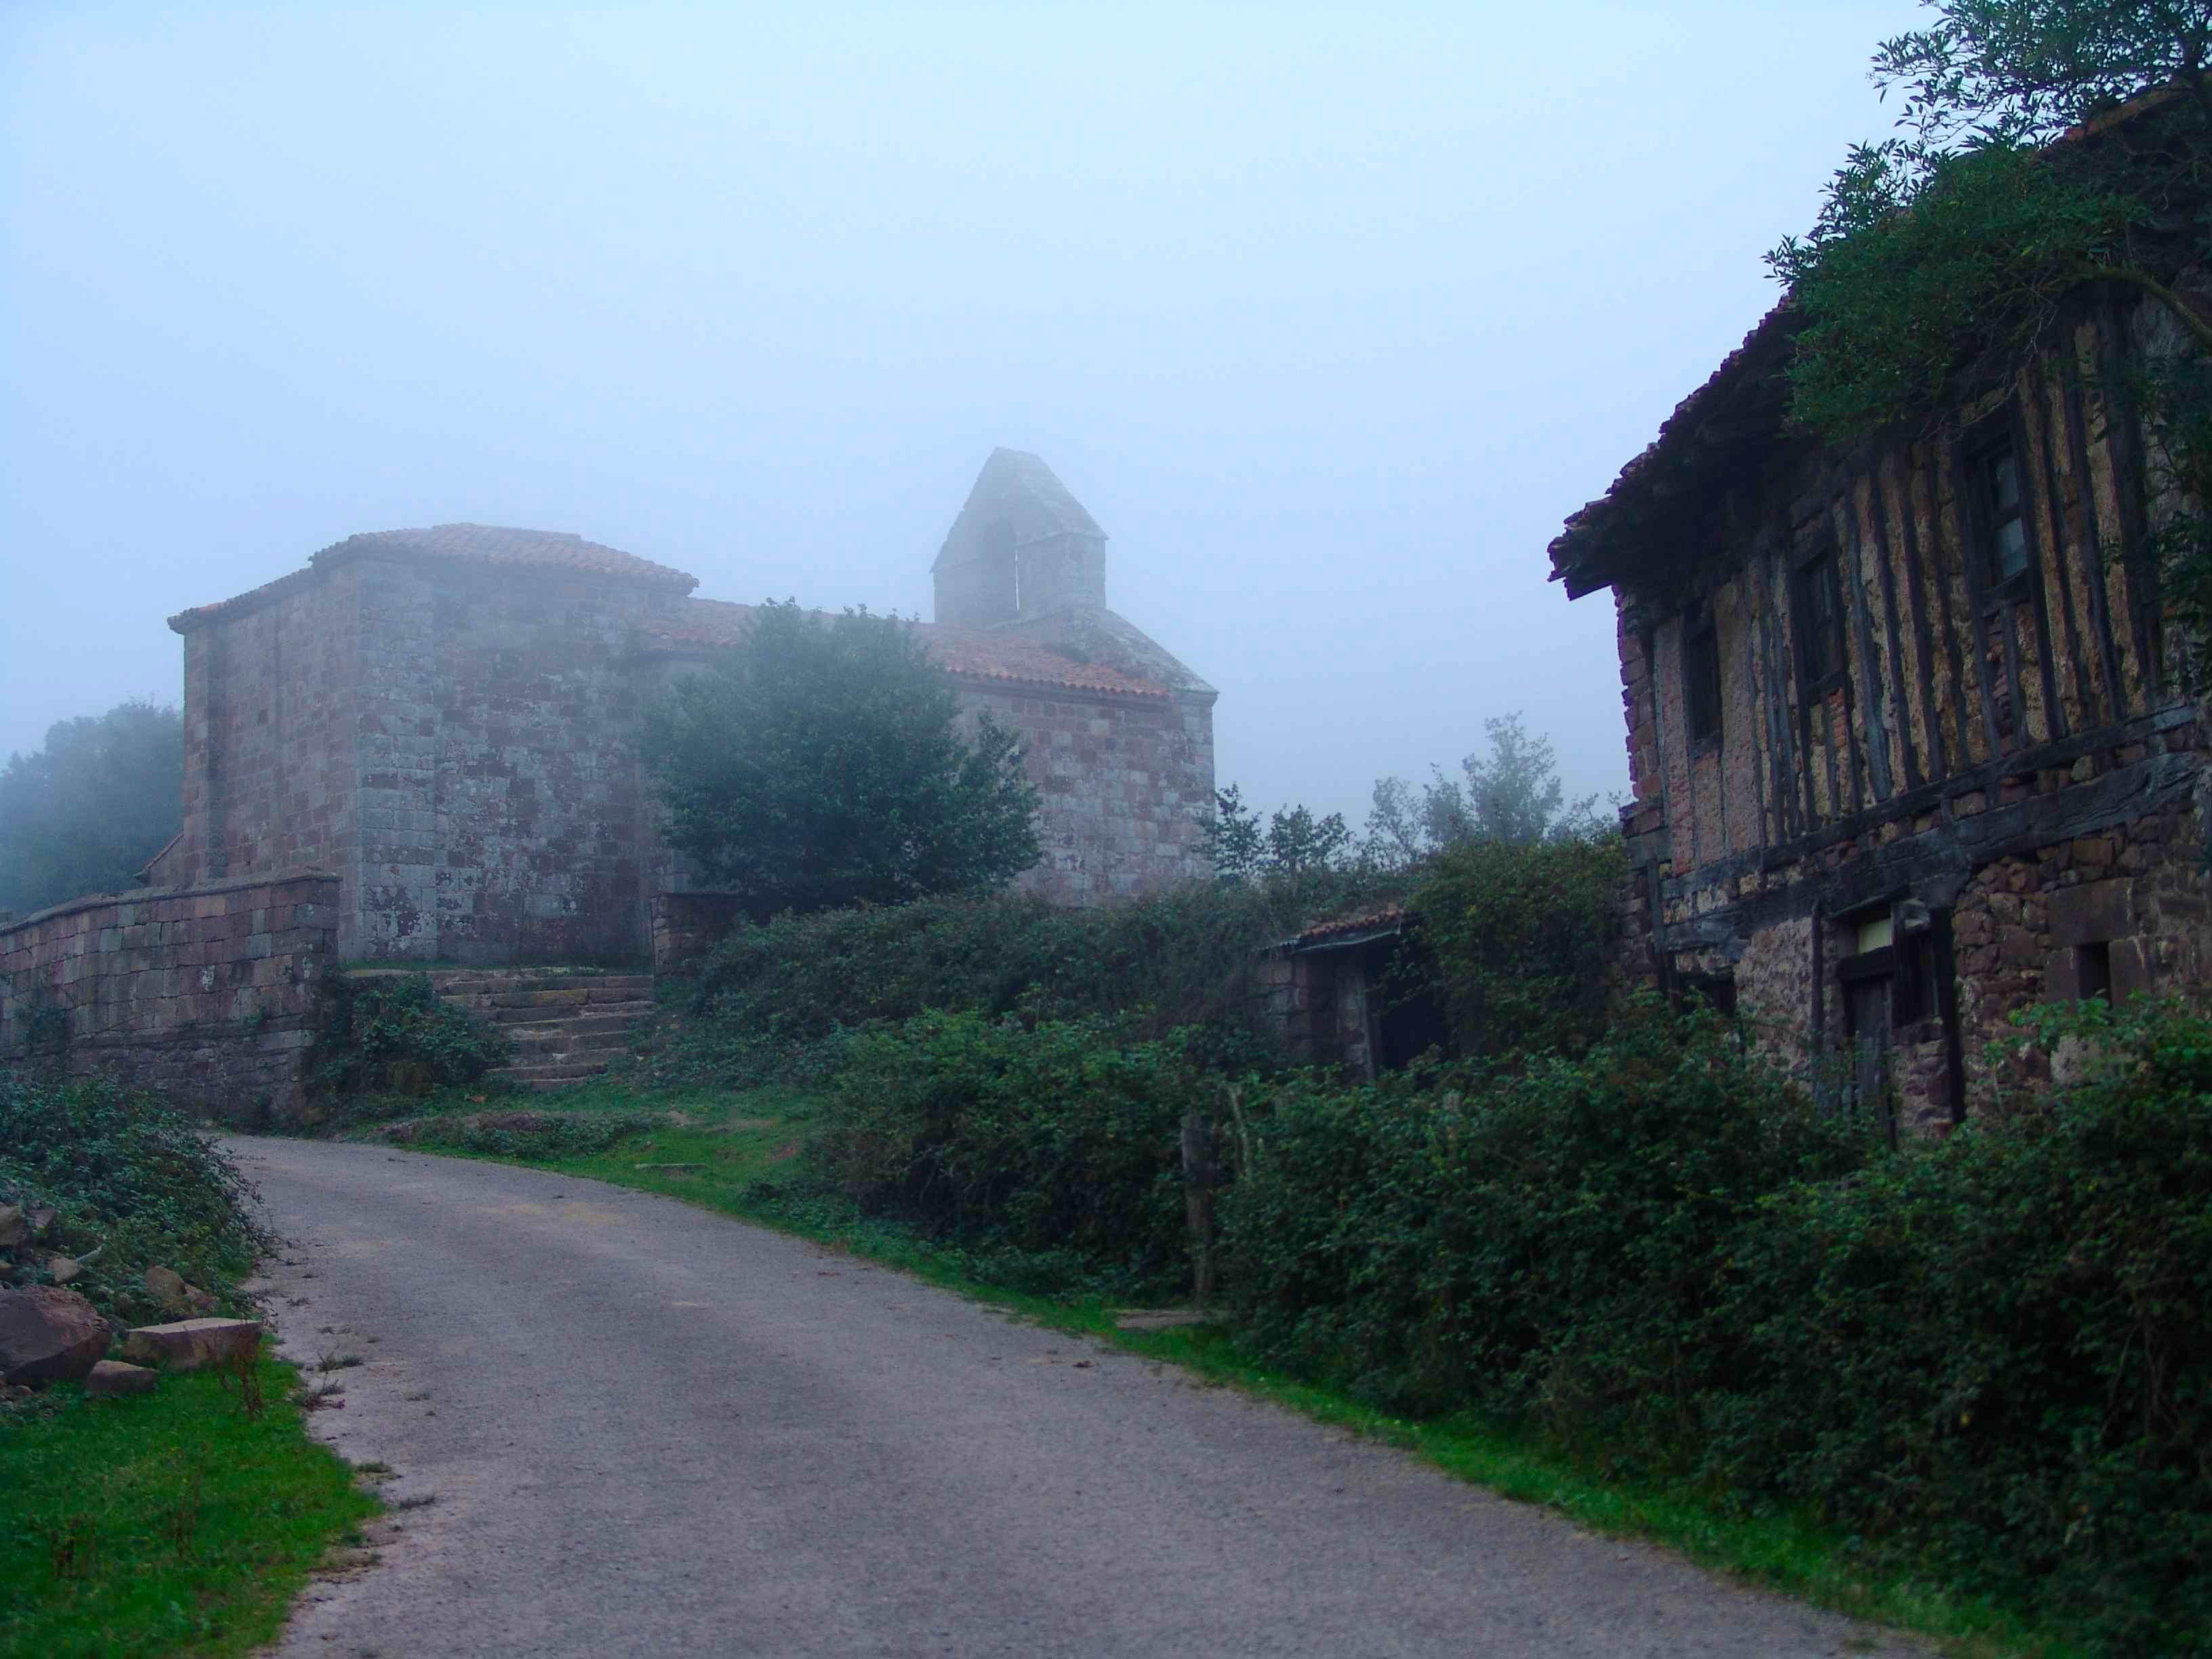 Vista iglesia de Somaconcha